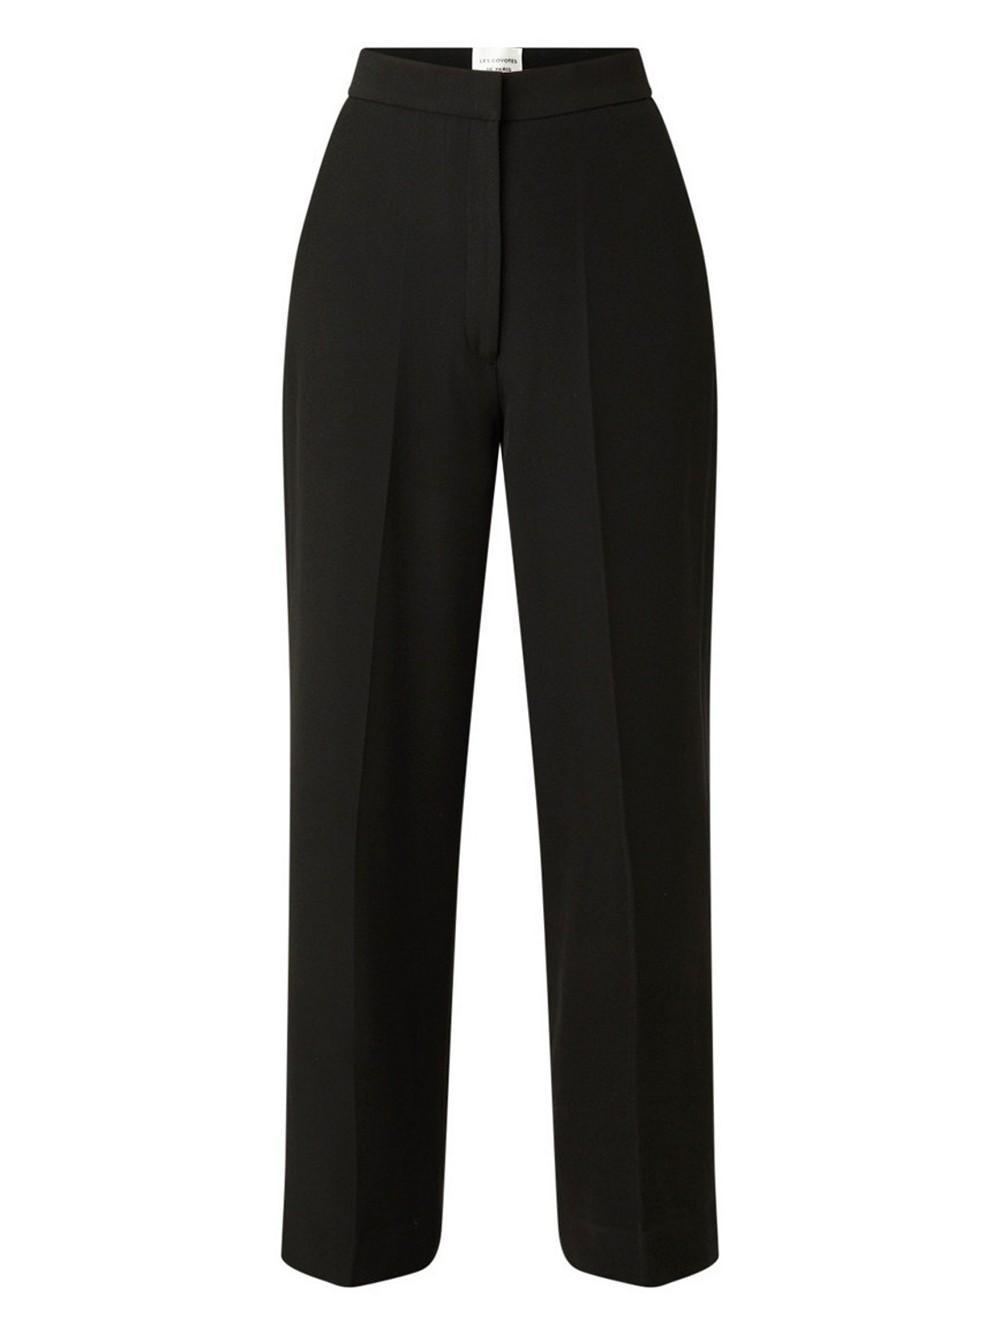 Carmen Wide Leg Trouser Item # 212-30-015